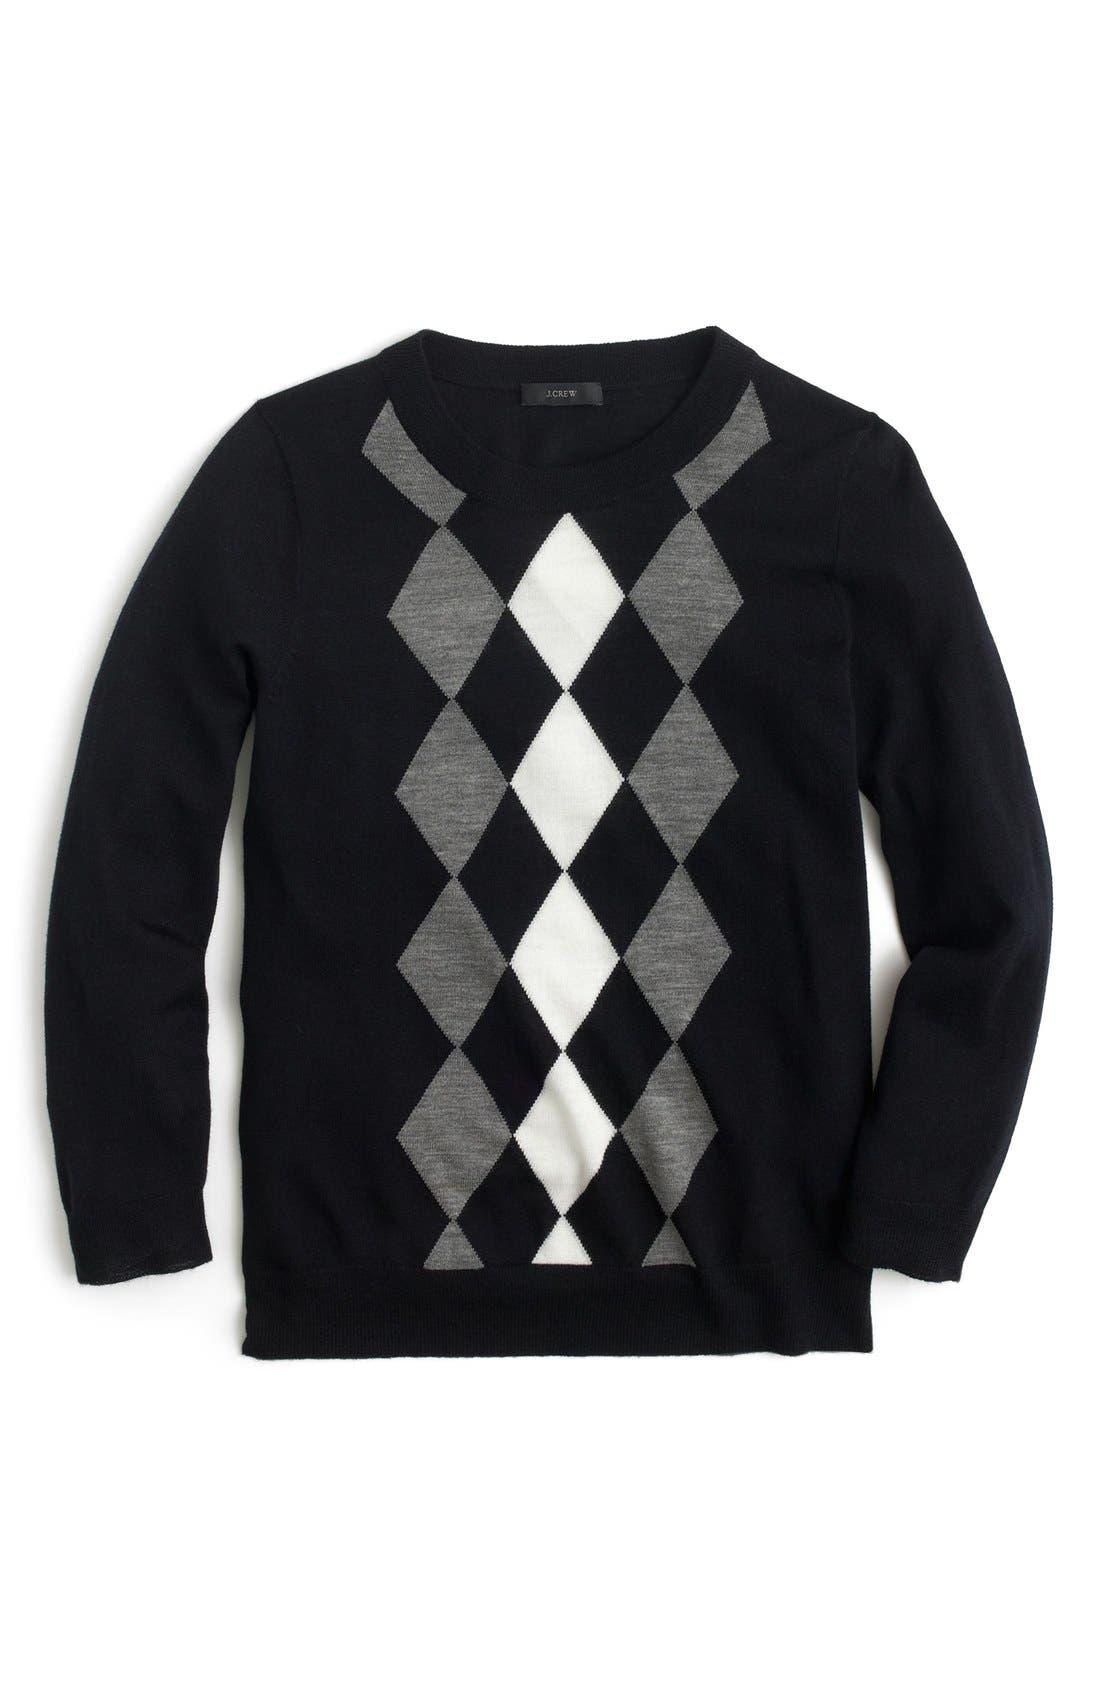 Main Image - J.Crew 'Tippi' Argyle Sweater